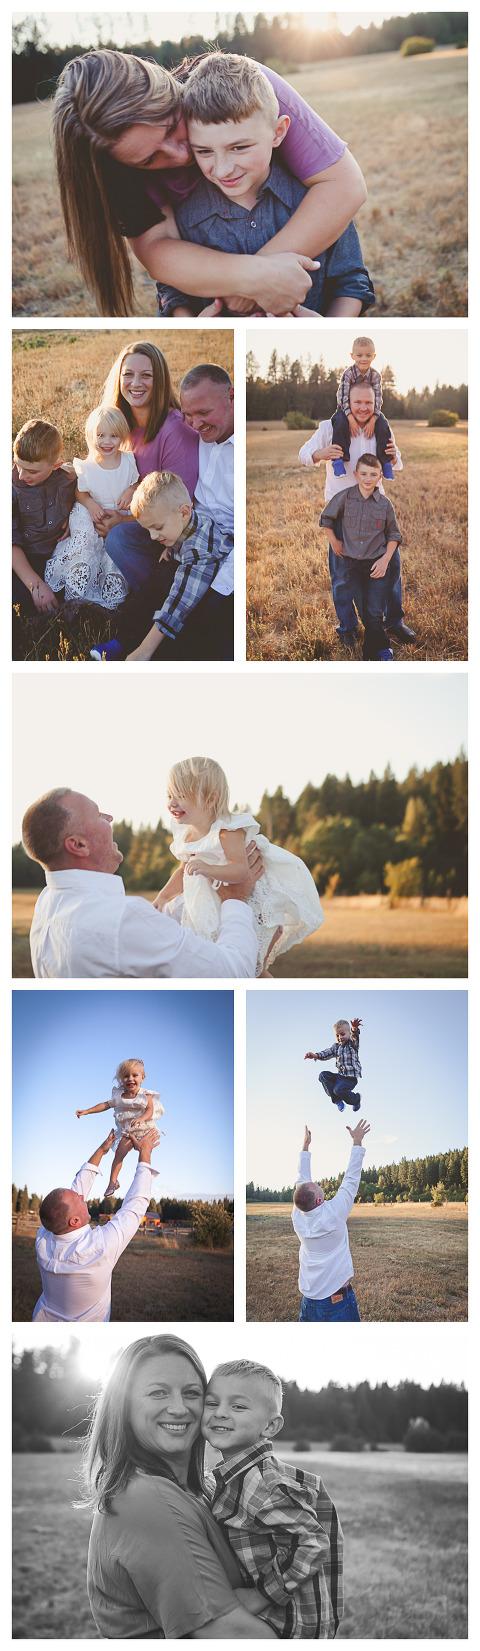 Girton Family, lifestyle photography by Hailey Haberman in Cle Elum, WA